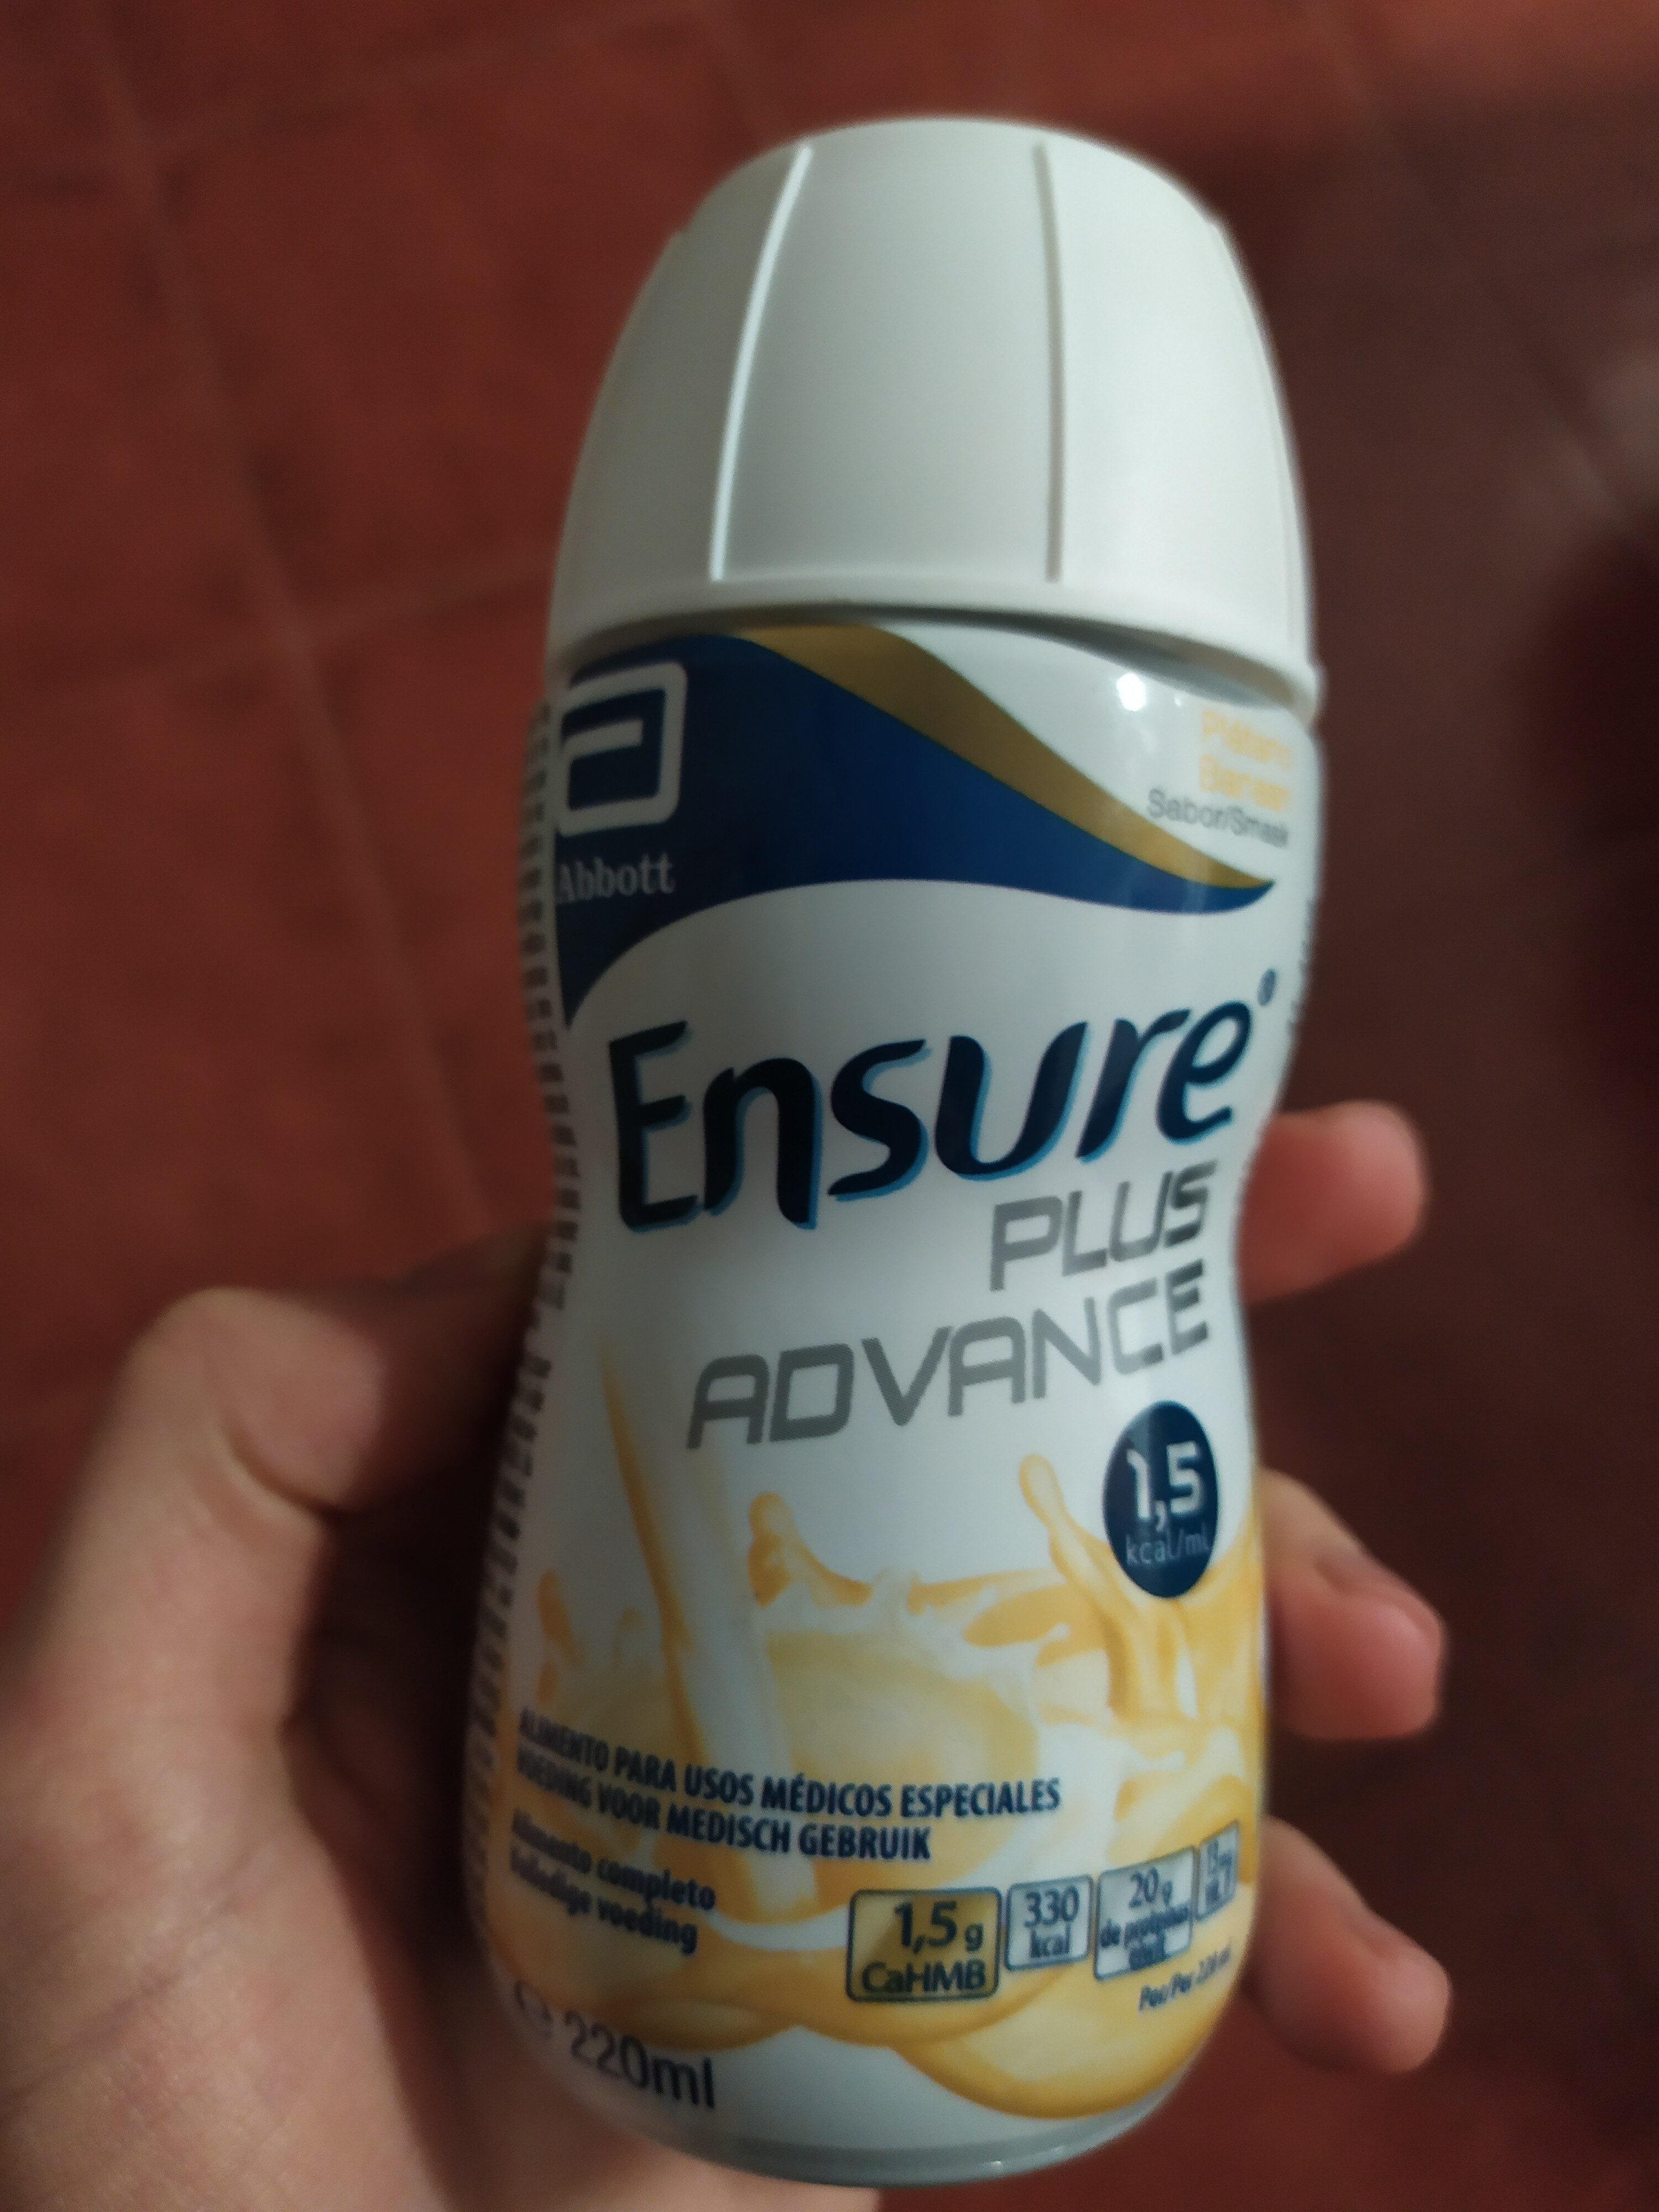 Ensure plus advance platano - Product